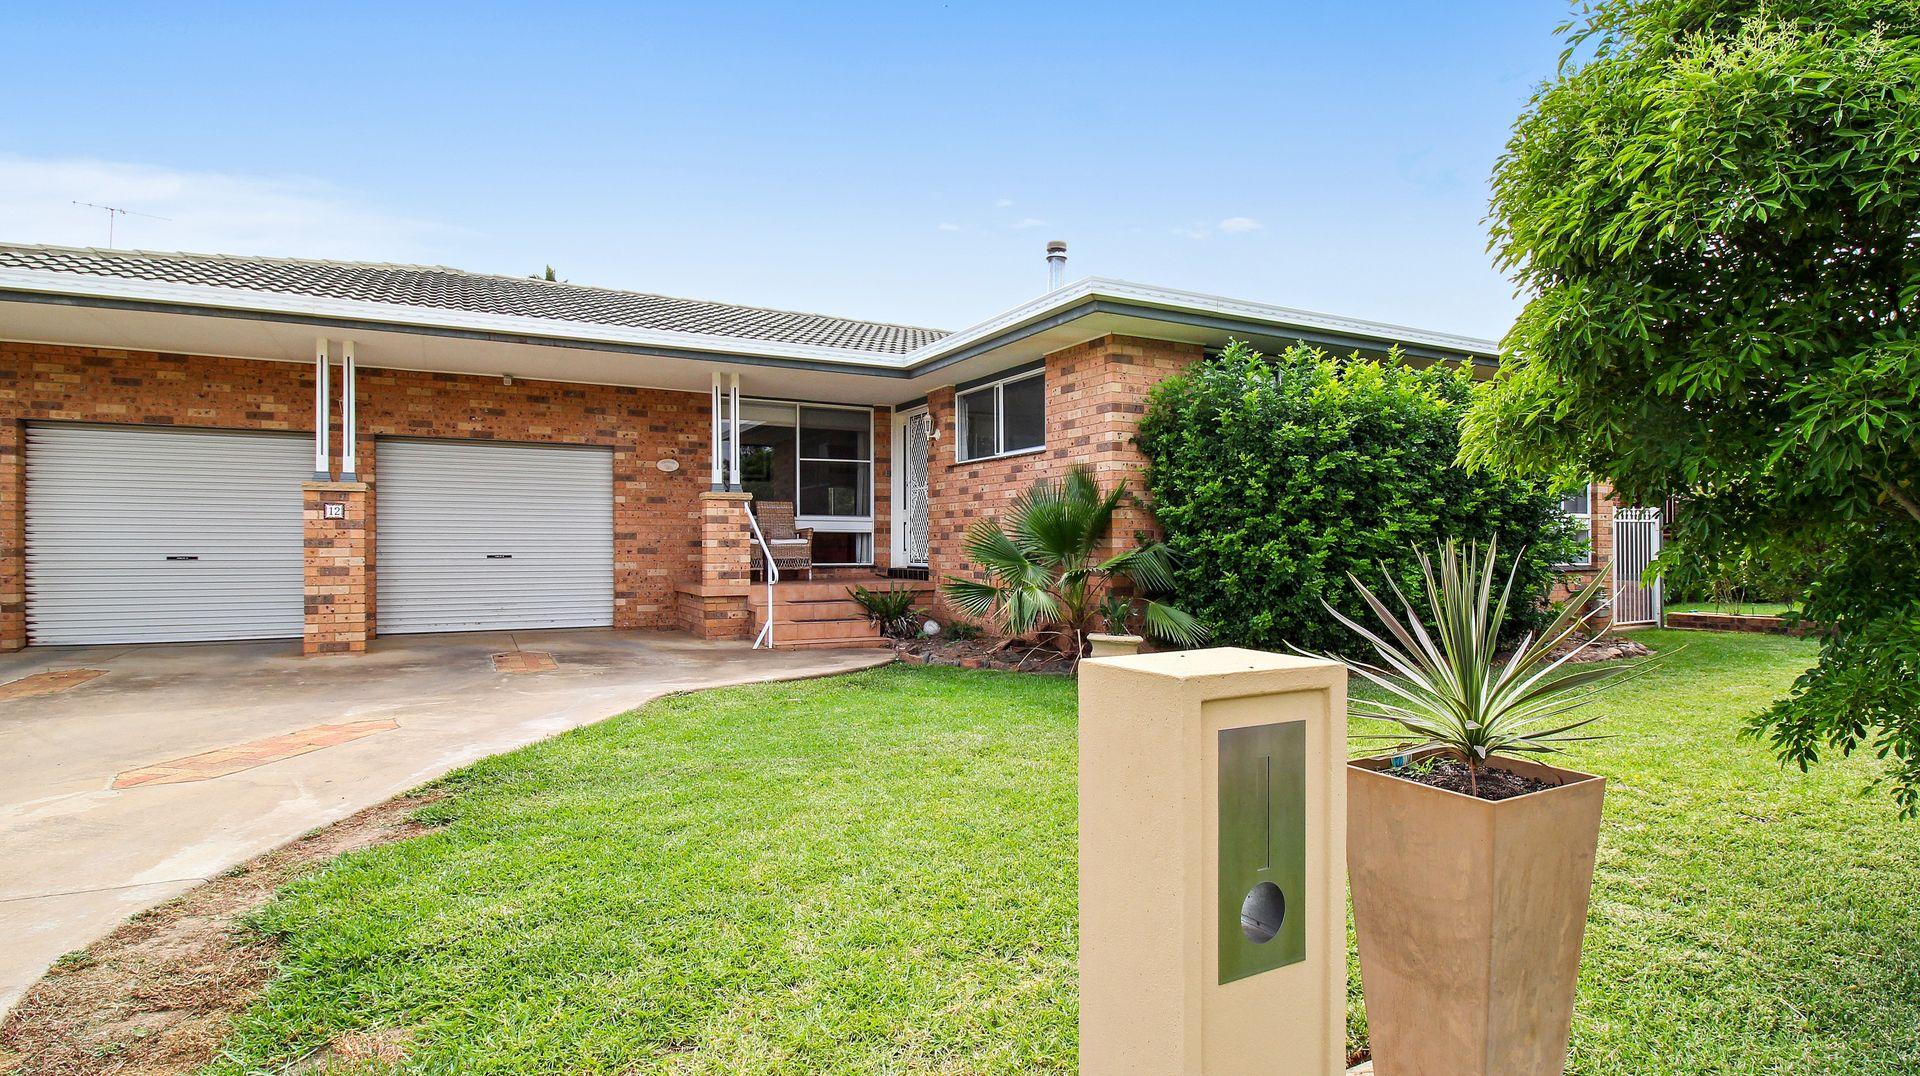 12 Koala Place, Forbes NSW 2871, Image 0